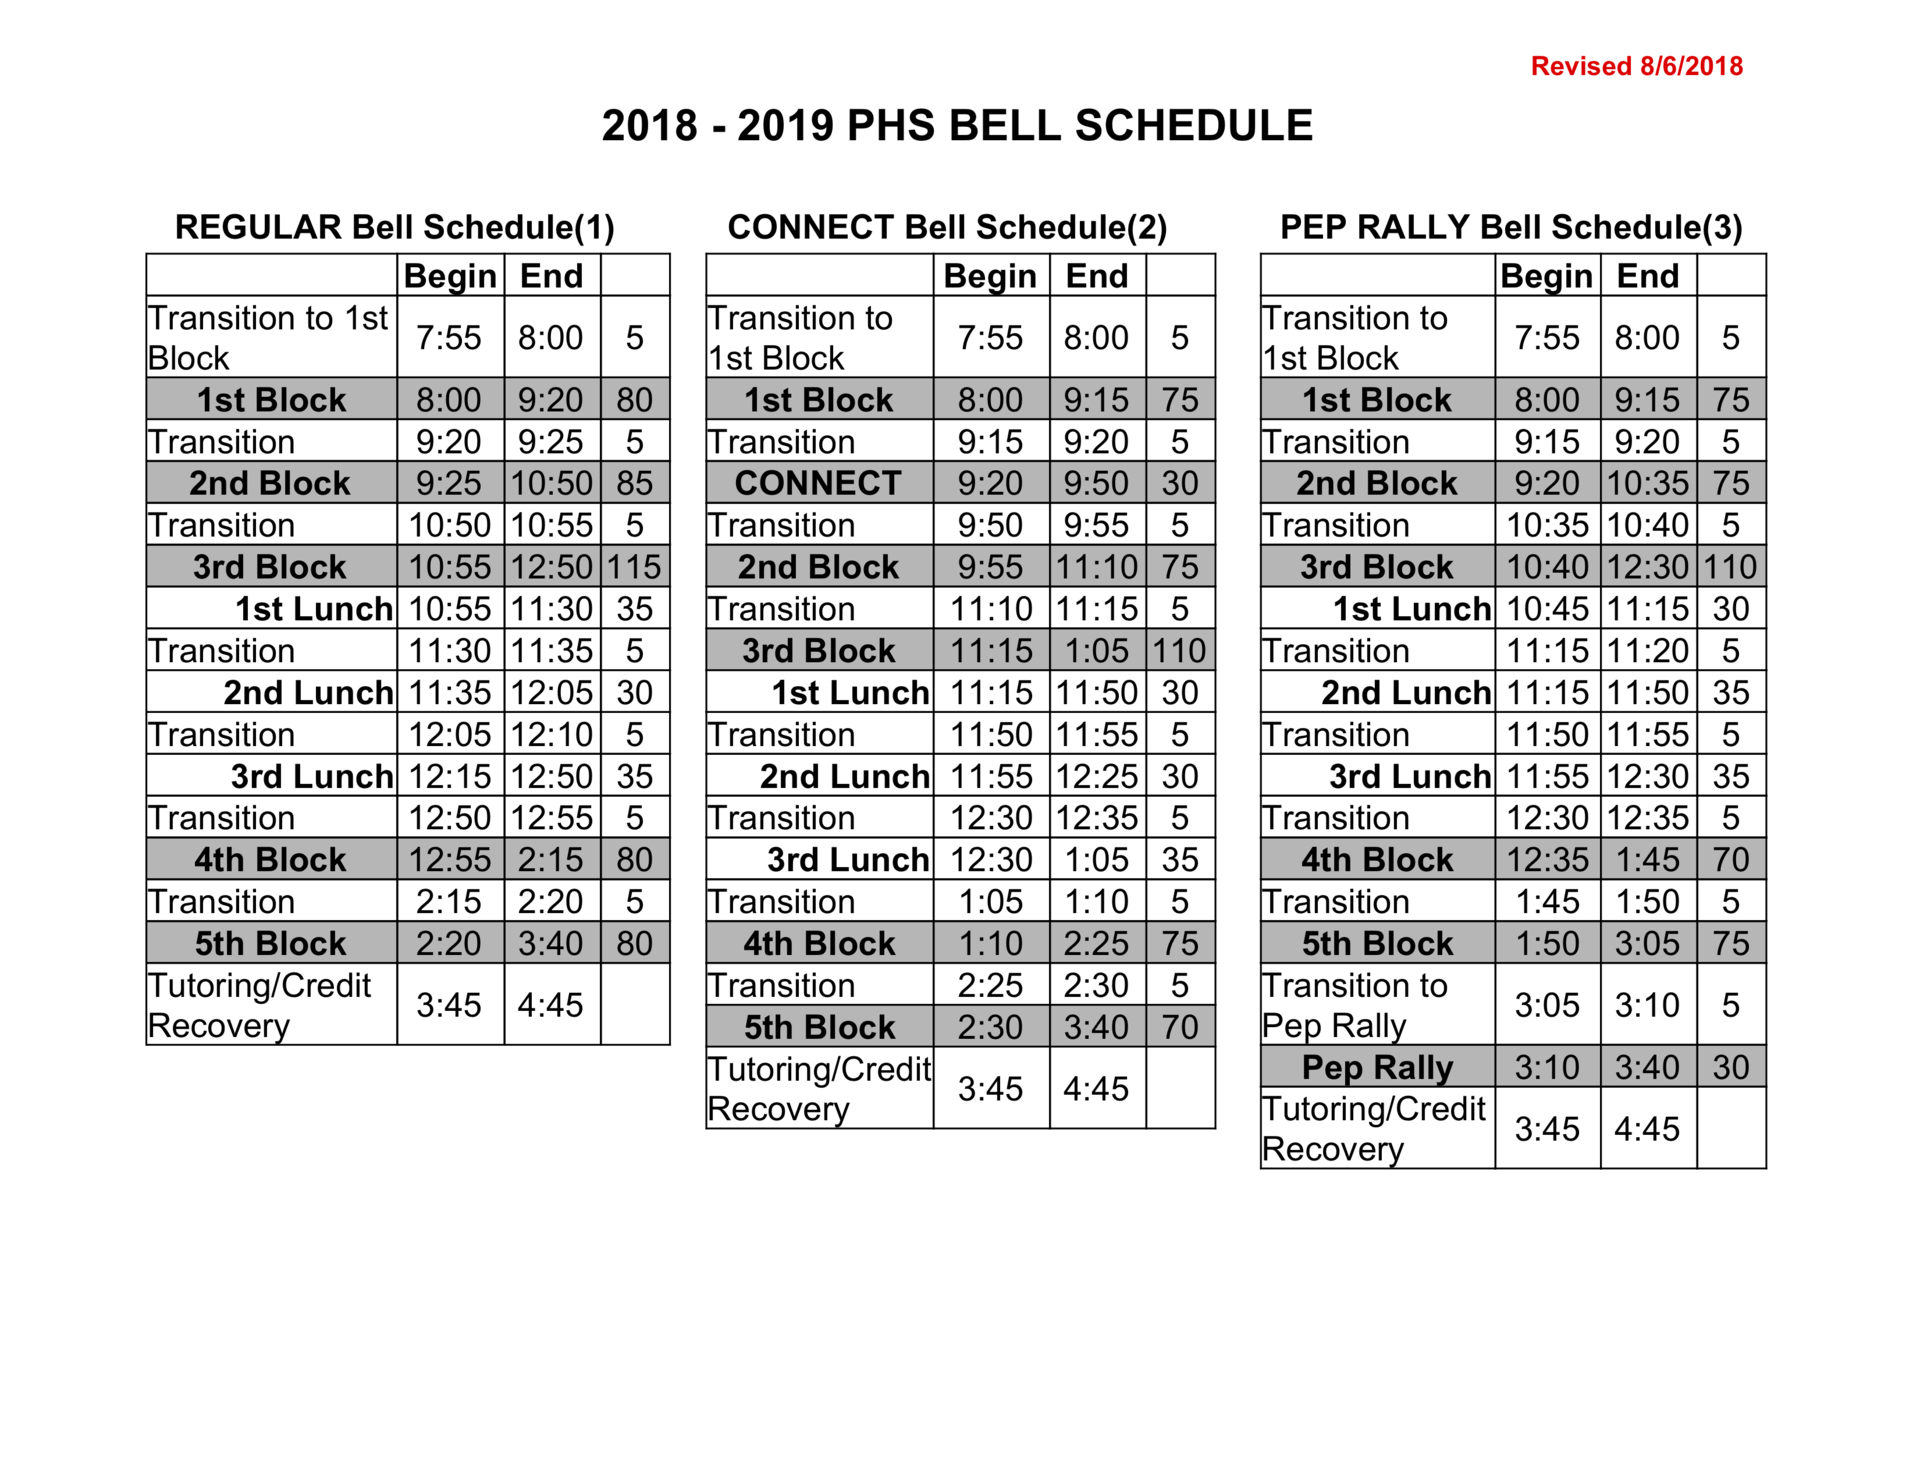 2018-2019 Bell Schedules